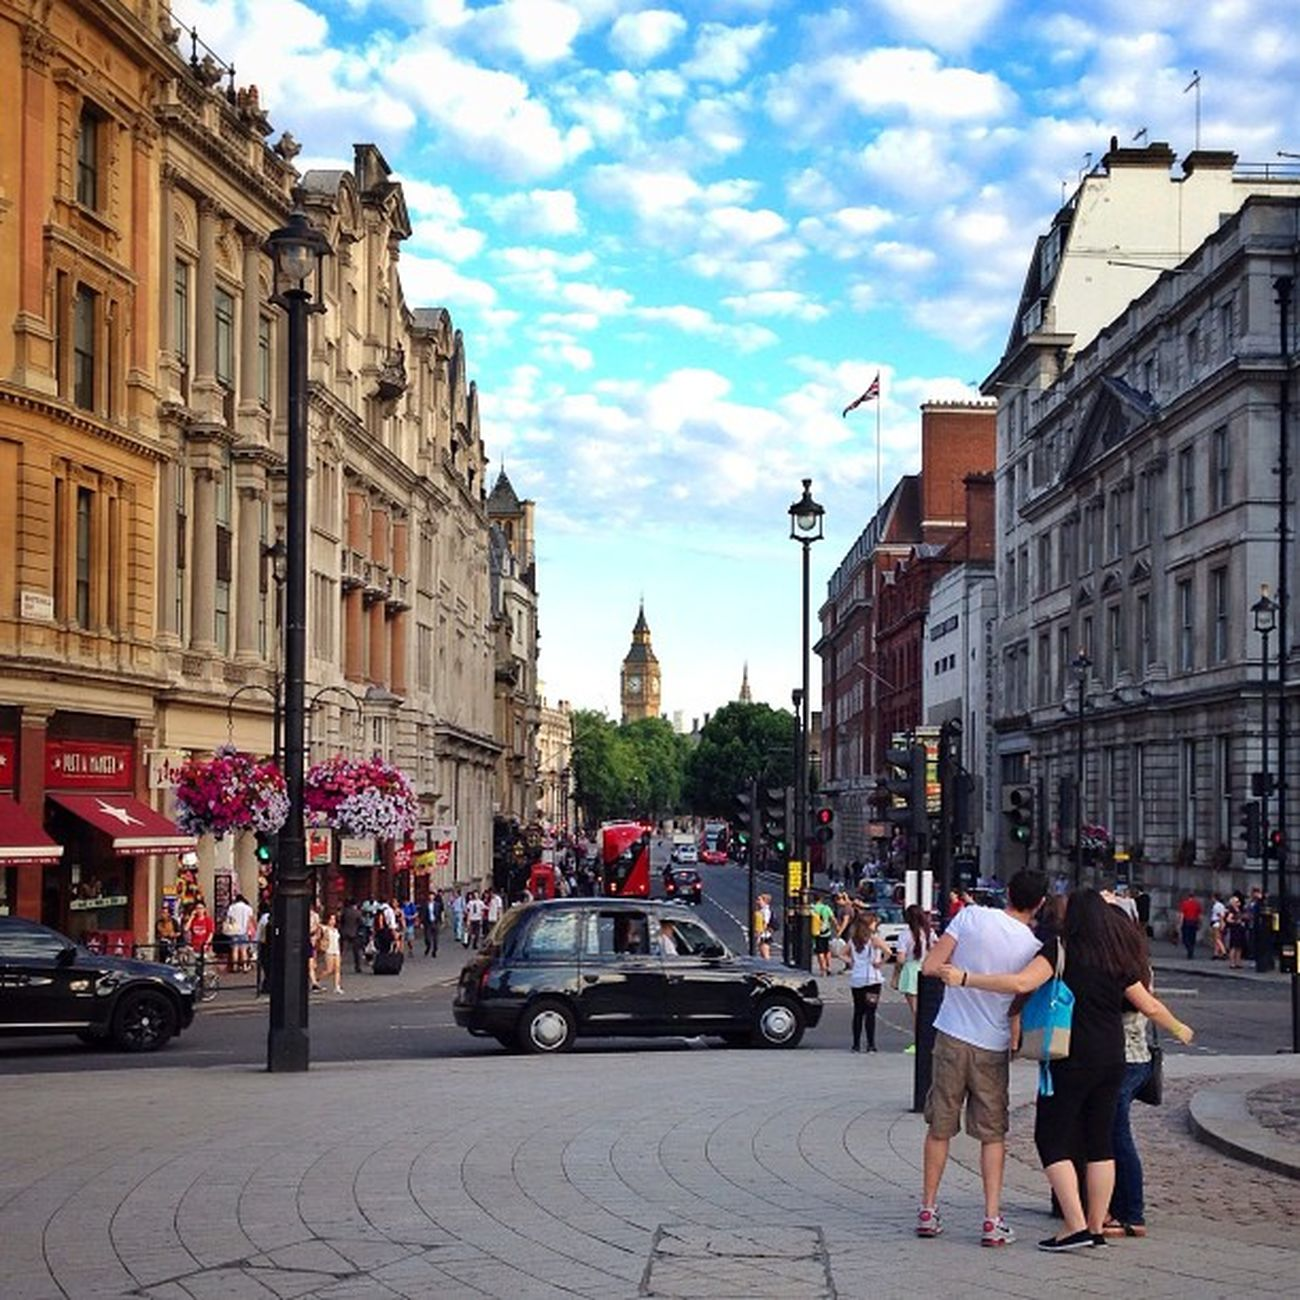 Enjoying #London ☀️?????☀️ #alan_in_london #gf_uk #gang_family #igers_london #insta_london #london_only #thisislondon #ic_cities #ic_cities_london #ig_england #love_london #gi_uk #ig_london #londonpop #allshots_ #aauk Gi_uk Igers_london Ig_england Love_london London Ic_cities_london Ig_london Gang_family Aauk Londonpop Yourturnbritain Allshots_ Top_masters London_only From_city Ic_cities Gf_uk Alan_in_london Insta_london Thisislondon